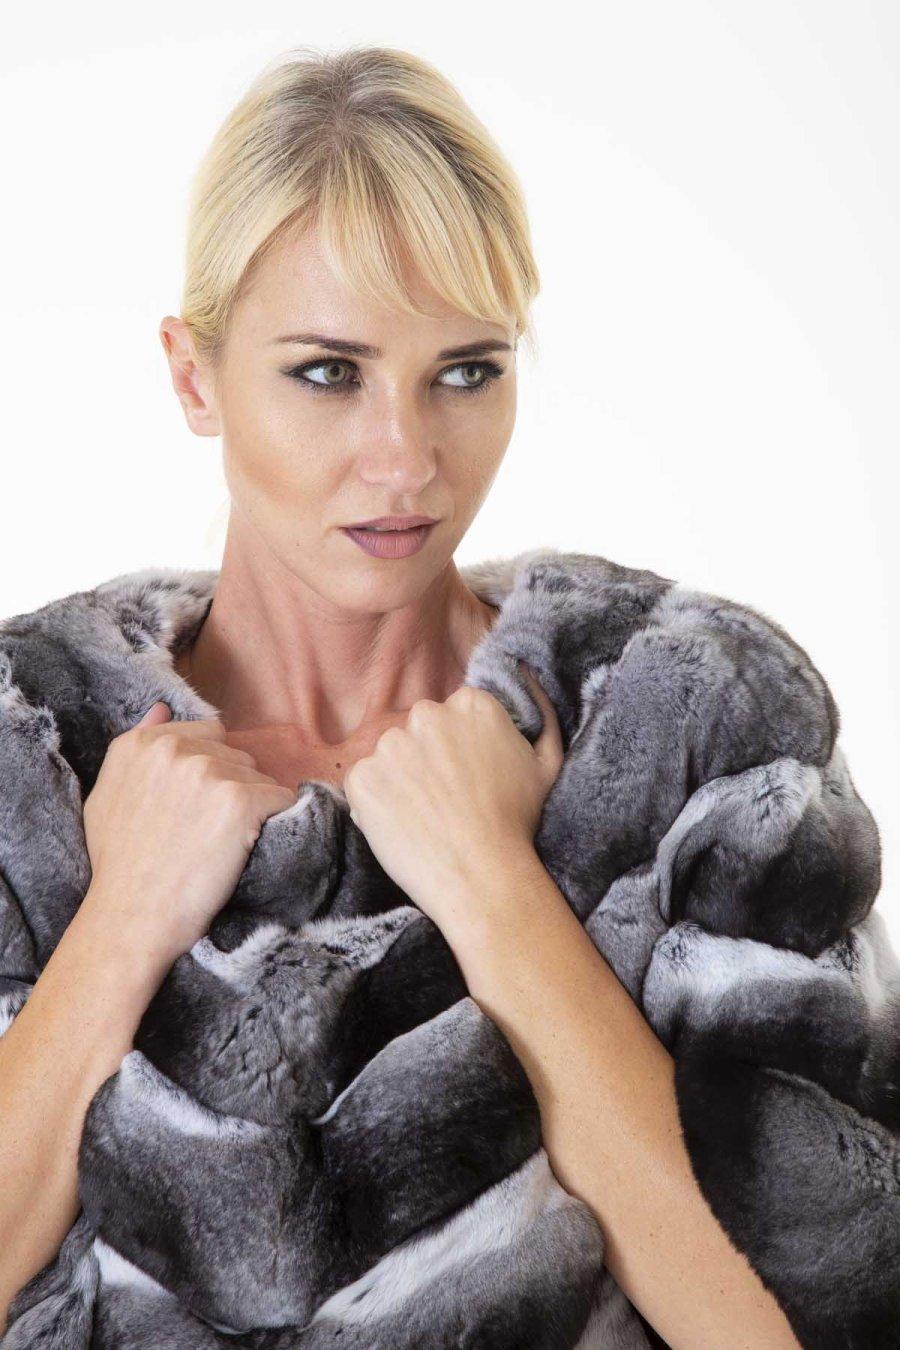 Chinchilla Fur Blouse | Блуза из меха шиншиллы с коротким рукавом - Sarigianni Furs